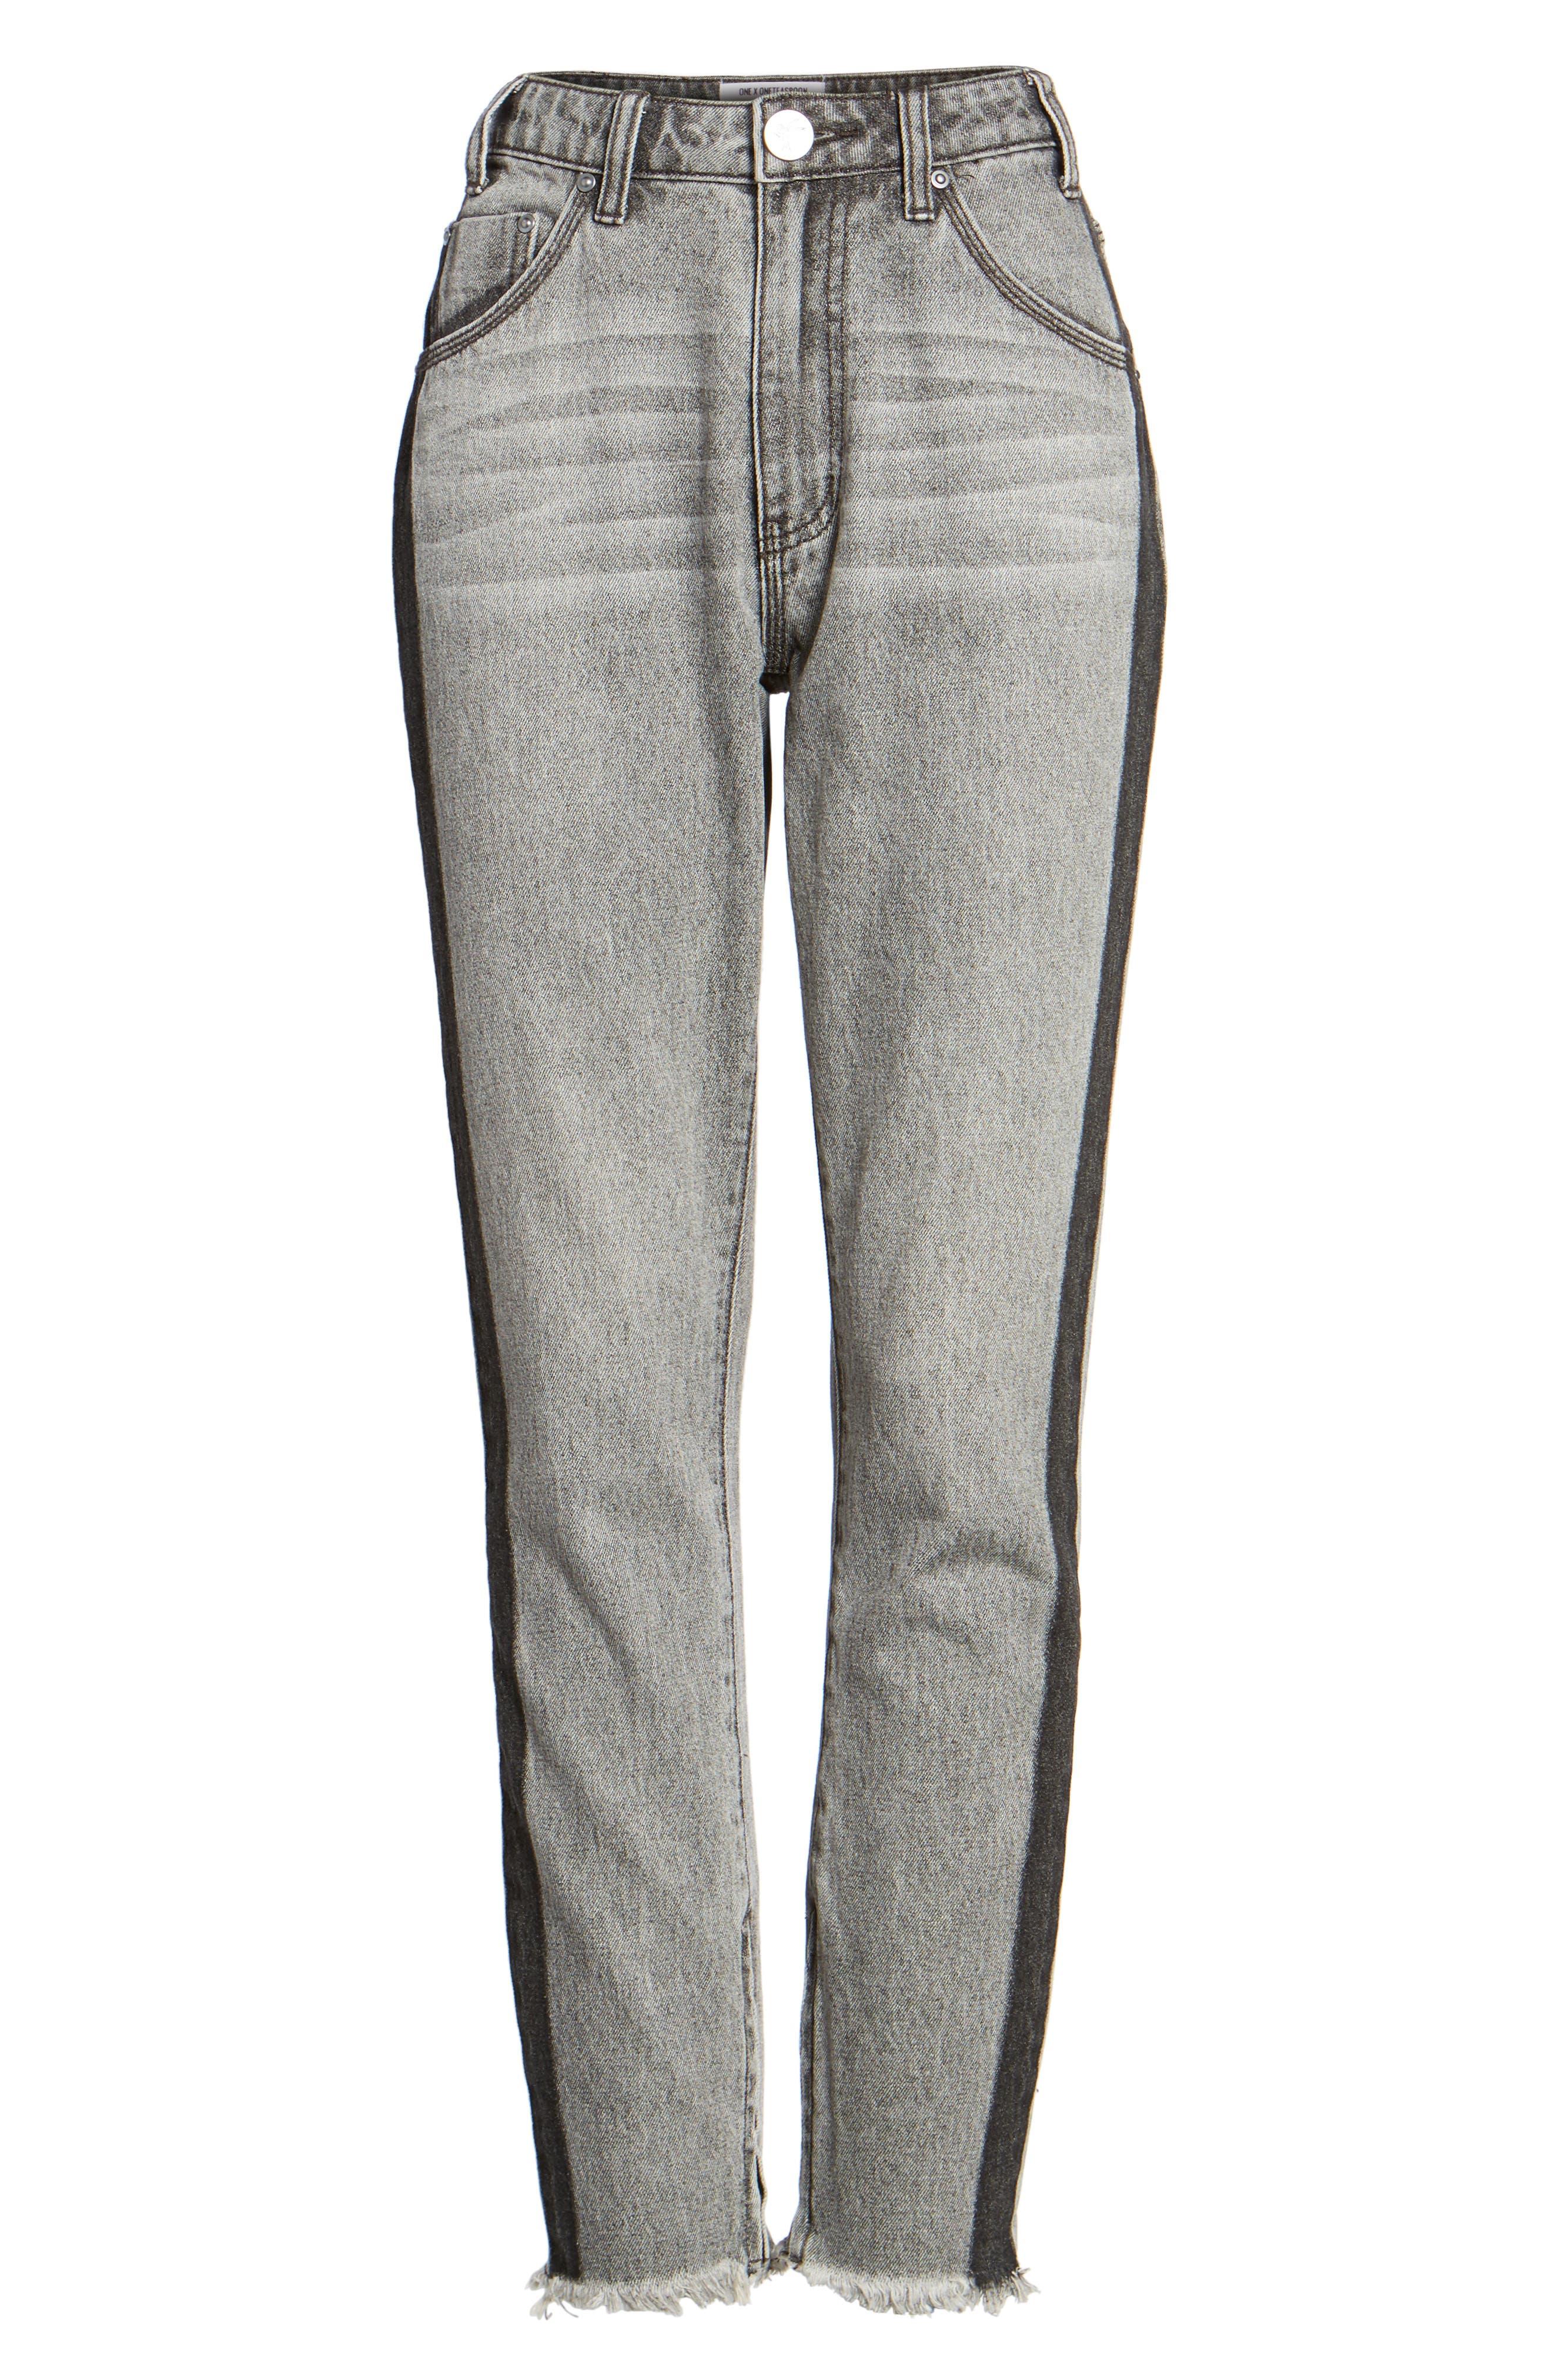 Freebirds High Waist Skinny Jeans,                             Alternate thumbnail 7, color,                             Camden